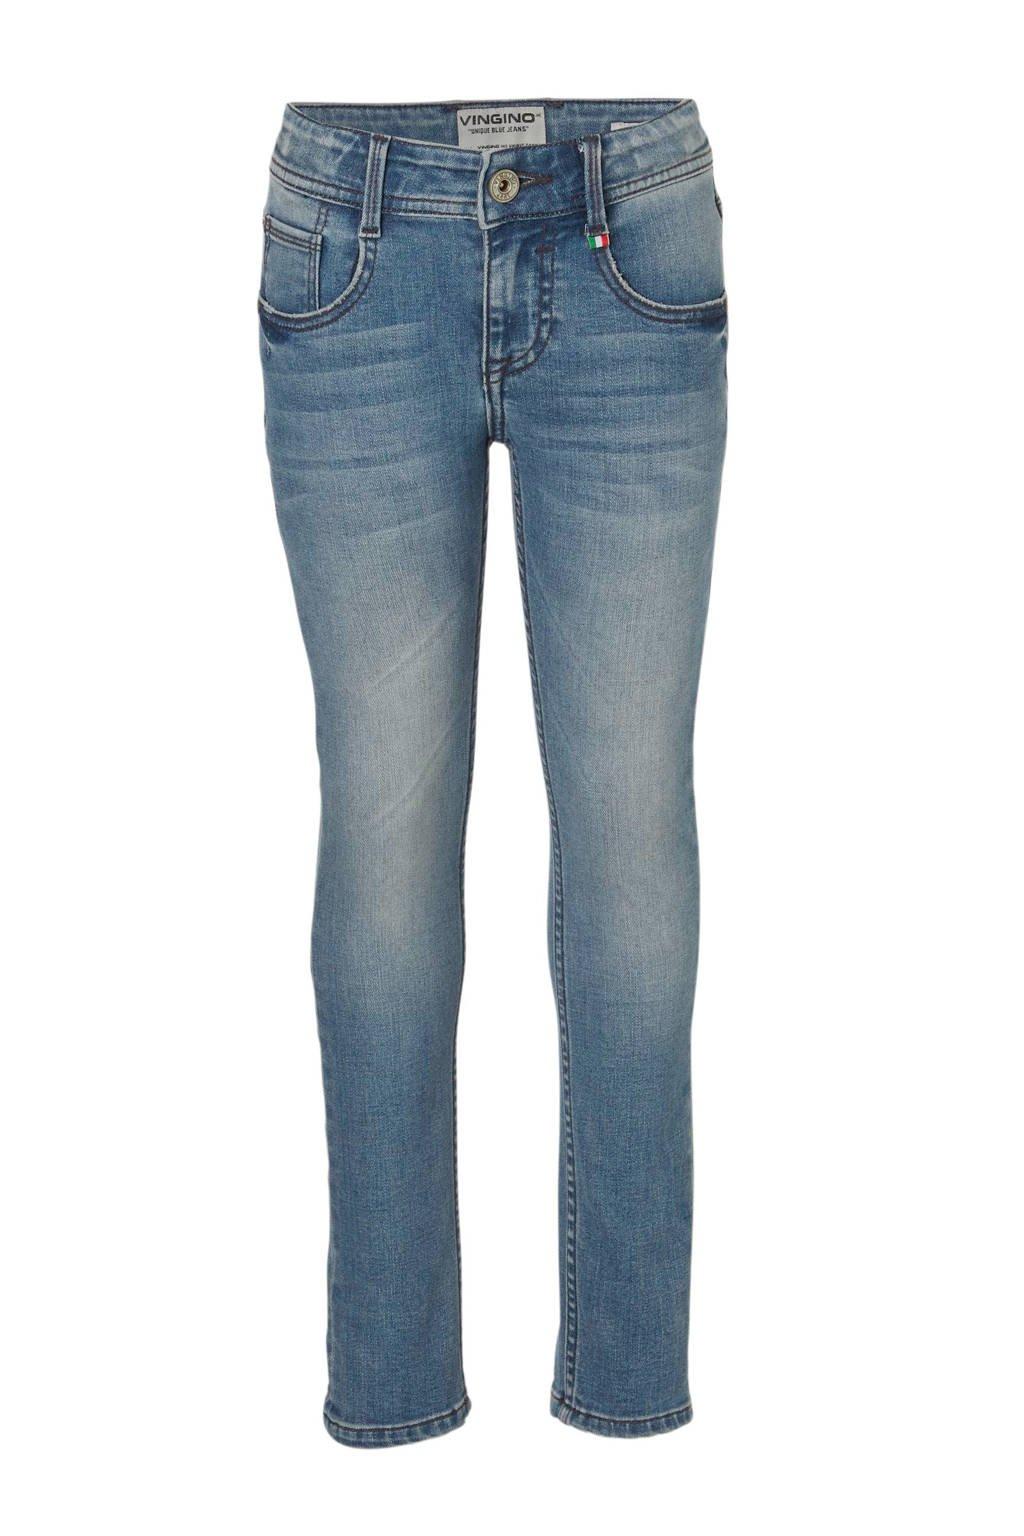 Vingino slim fit jeans Aragon, Light Indigo